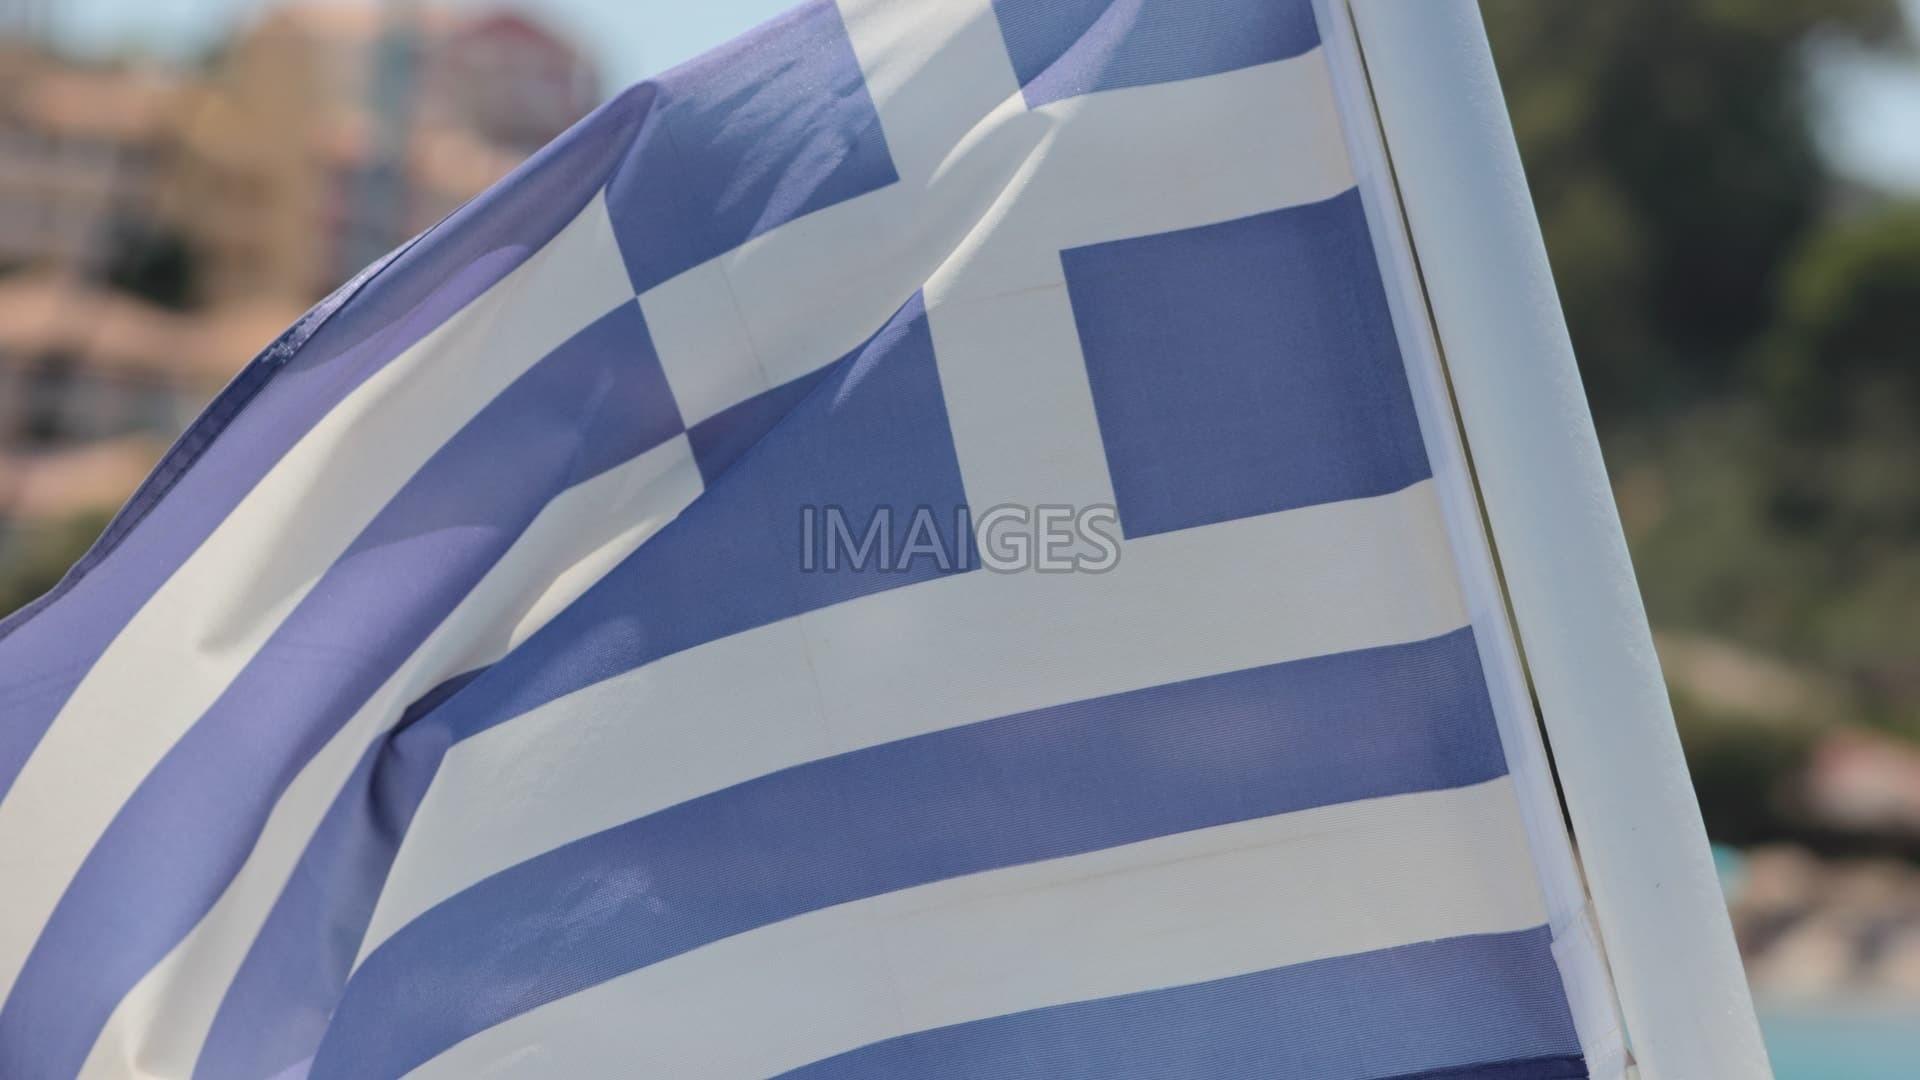 Greek flag wallpaper 52 images - Greek flag wallpaper ...